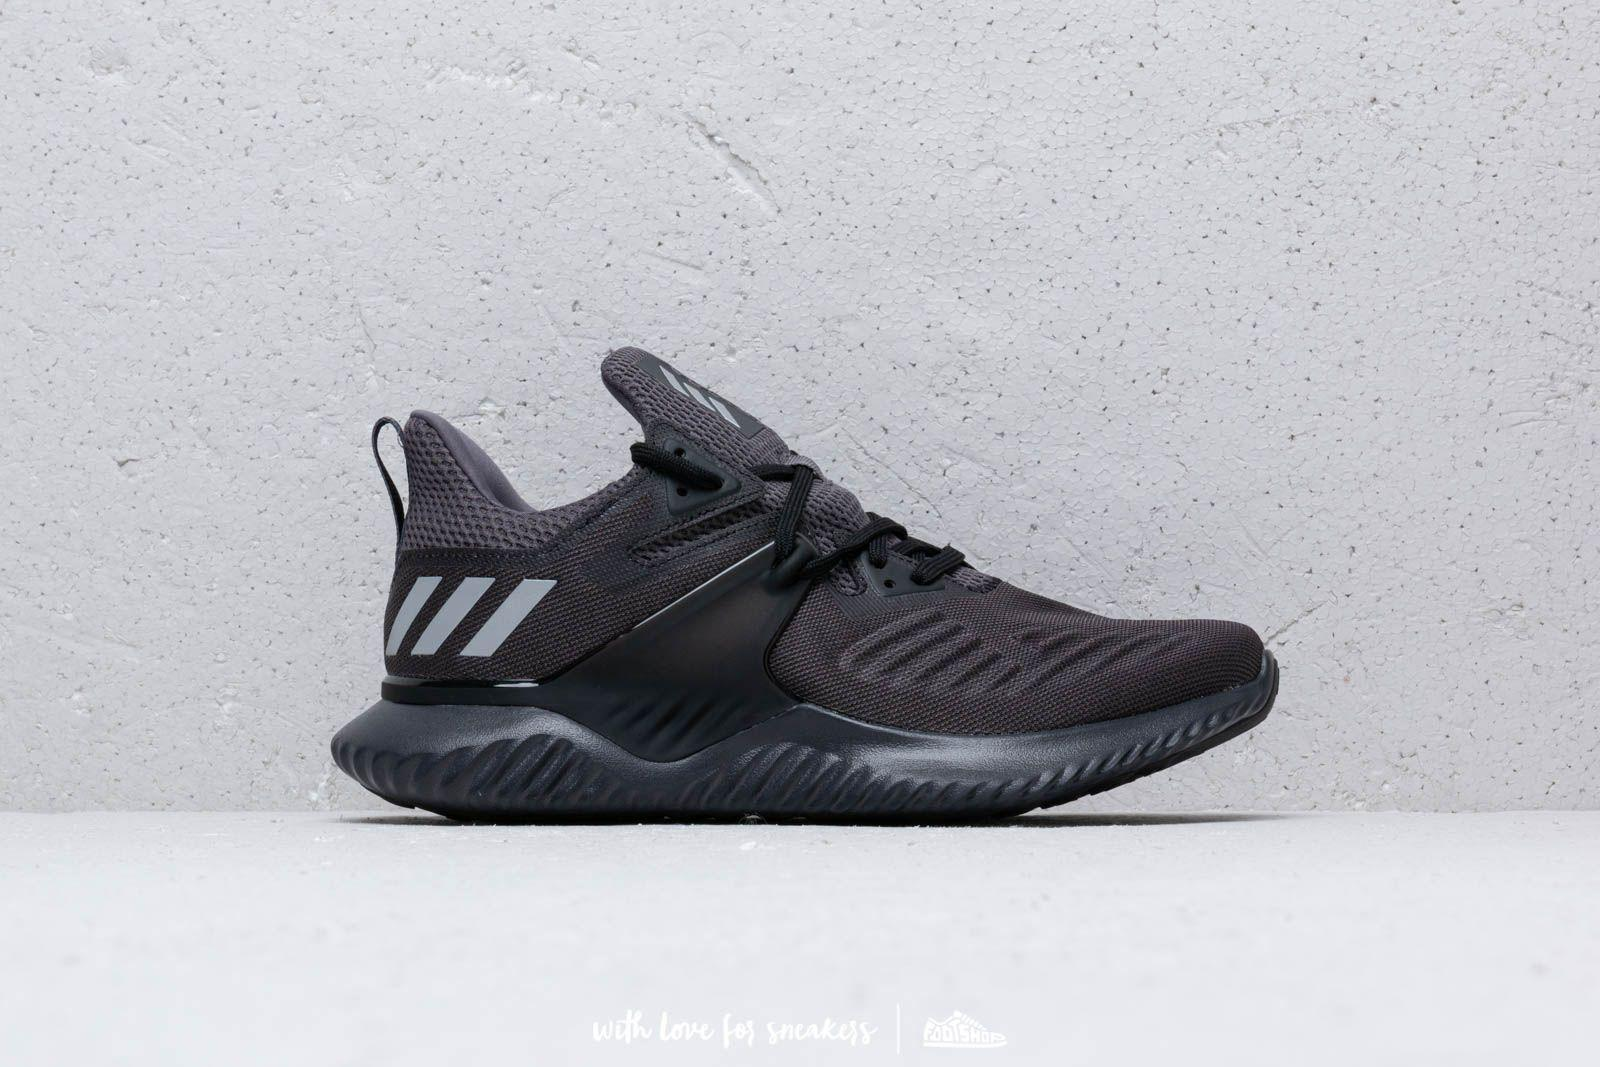 separation shoes cb54b 07745 Adidas Originals - Adidas Alphabounce Beyond 2 M Core Black Silvmt Carbon  for Men. View fullscreen